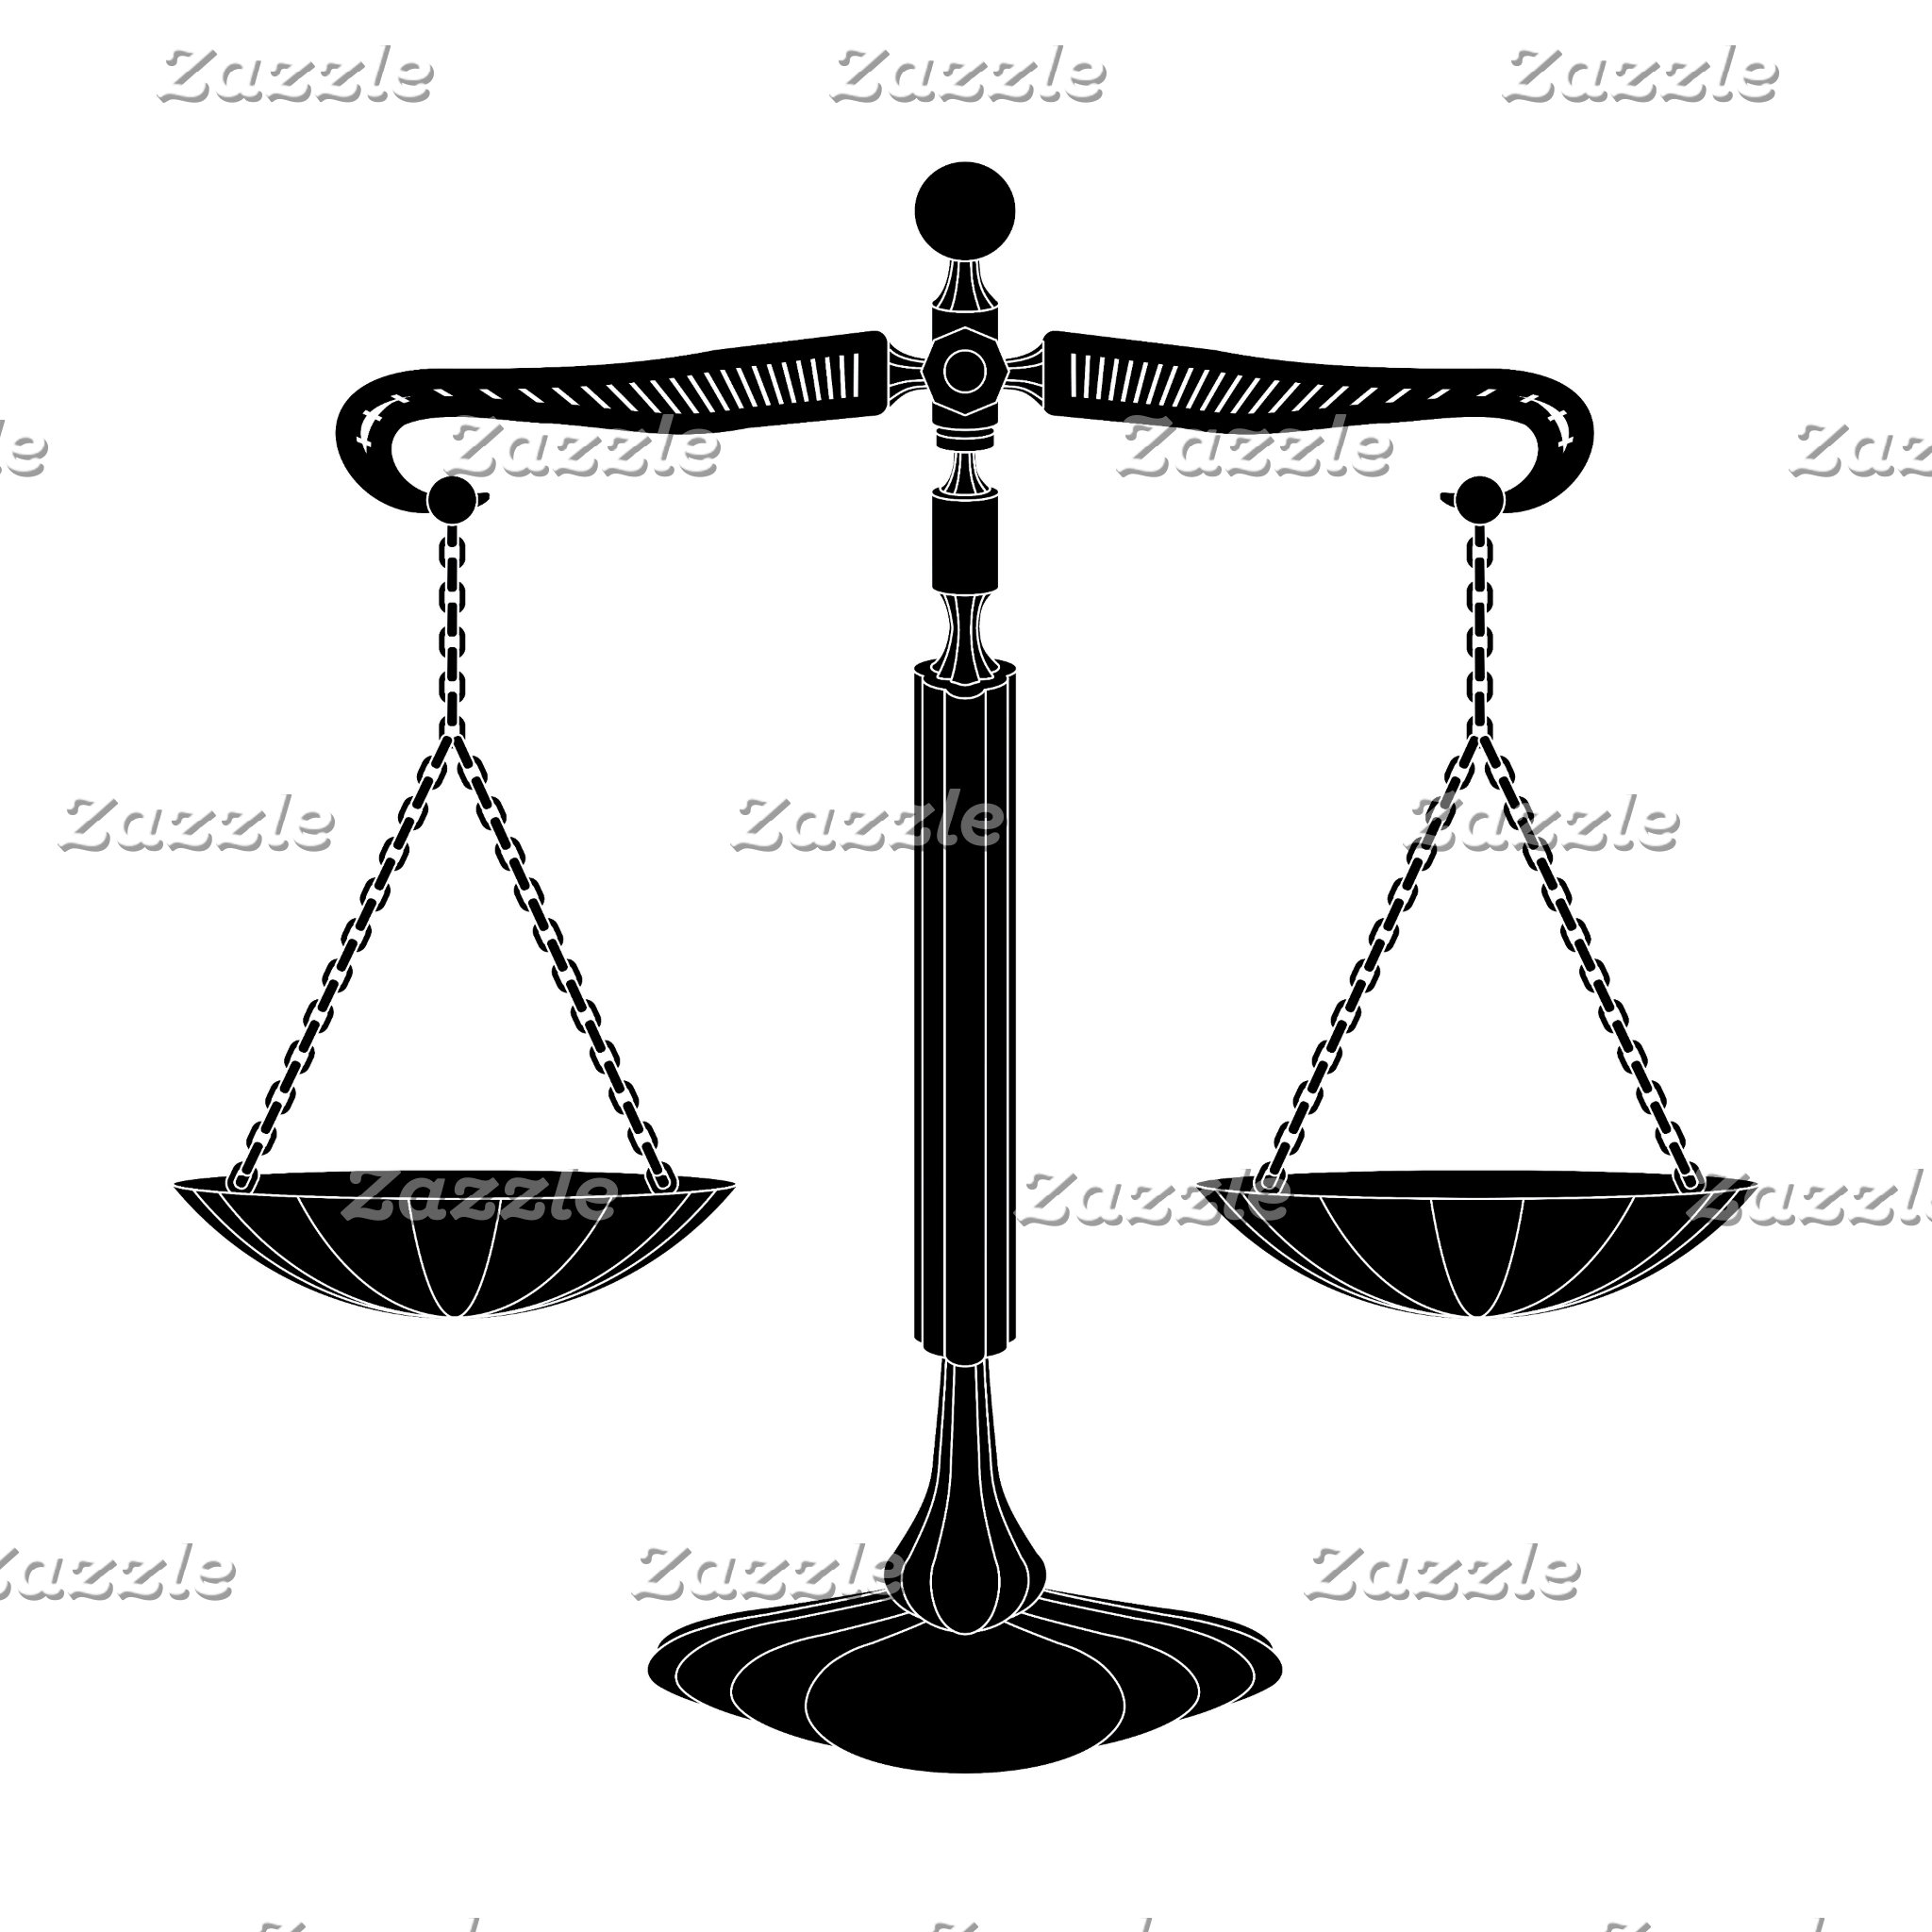 ► Law & Order